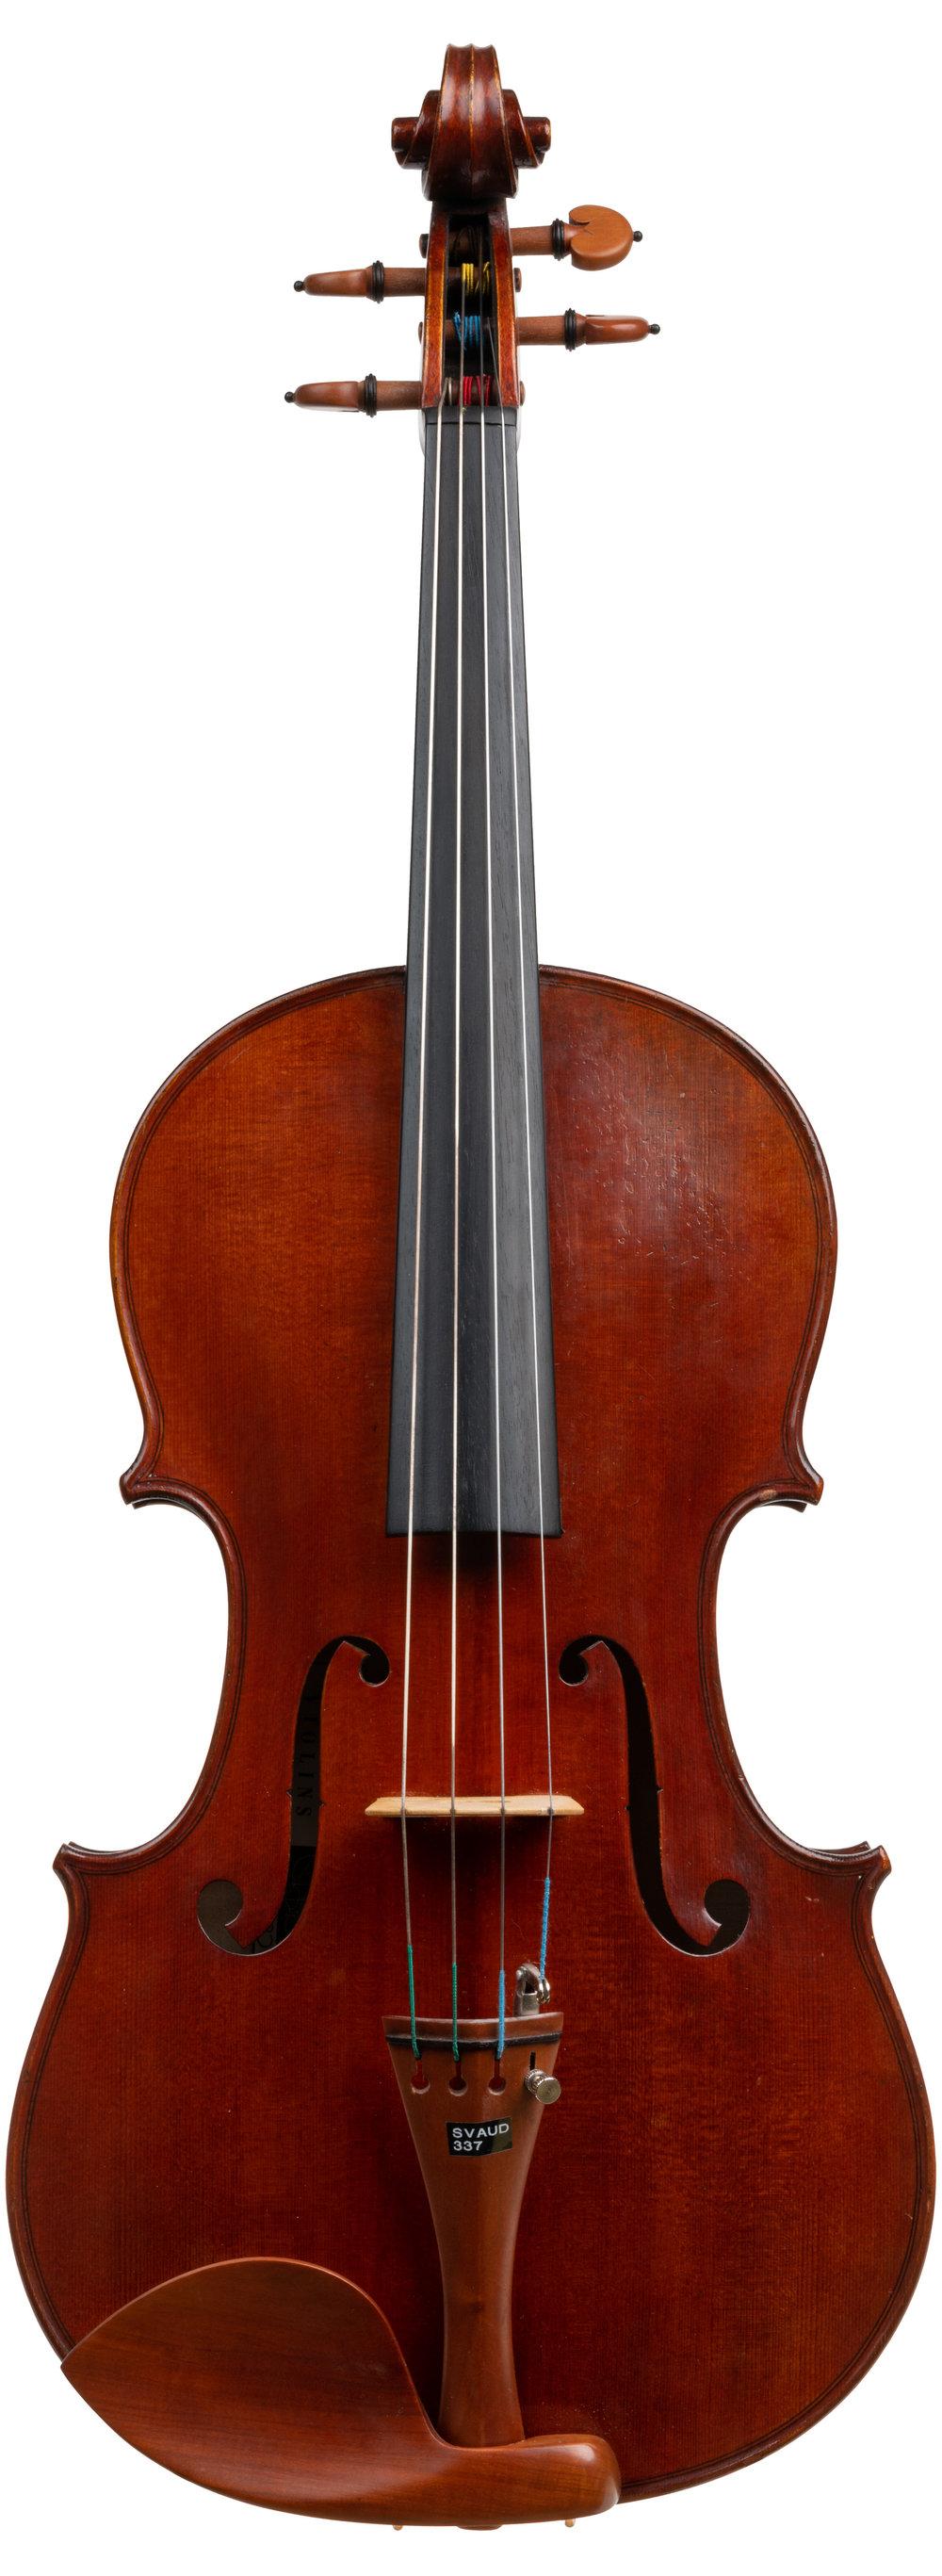 Seman Violins SVAUD 337 front.jpg